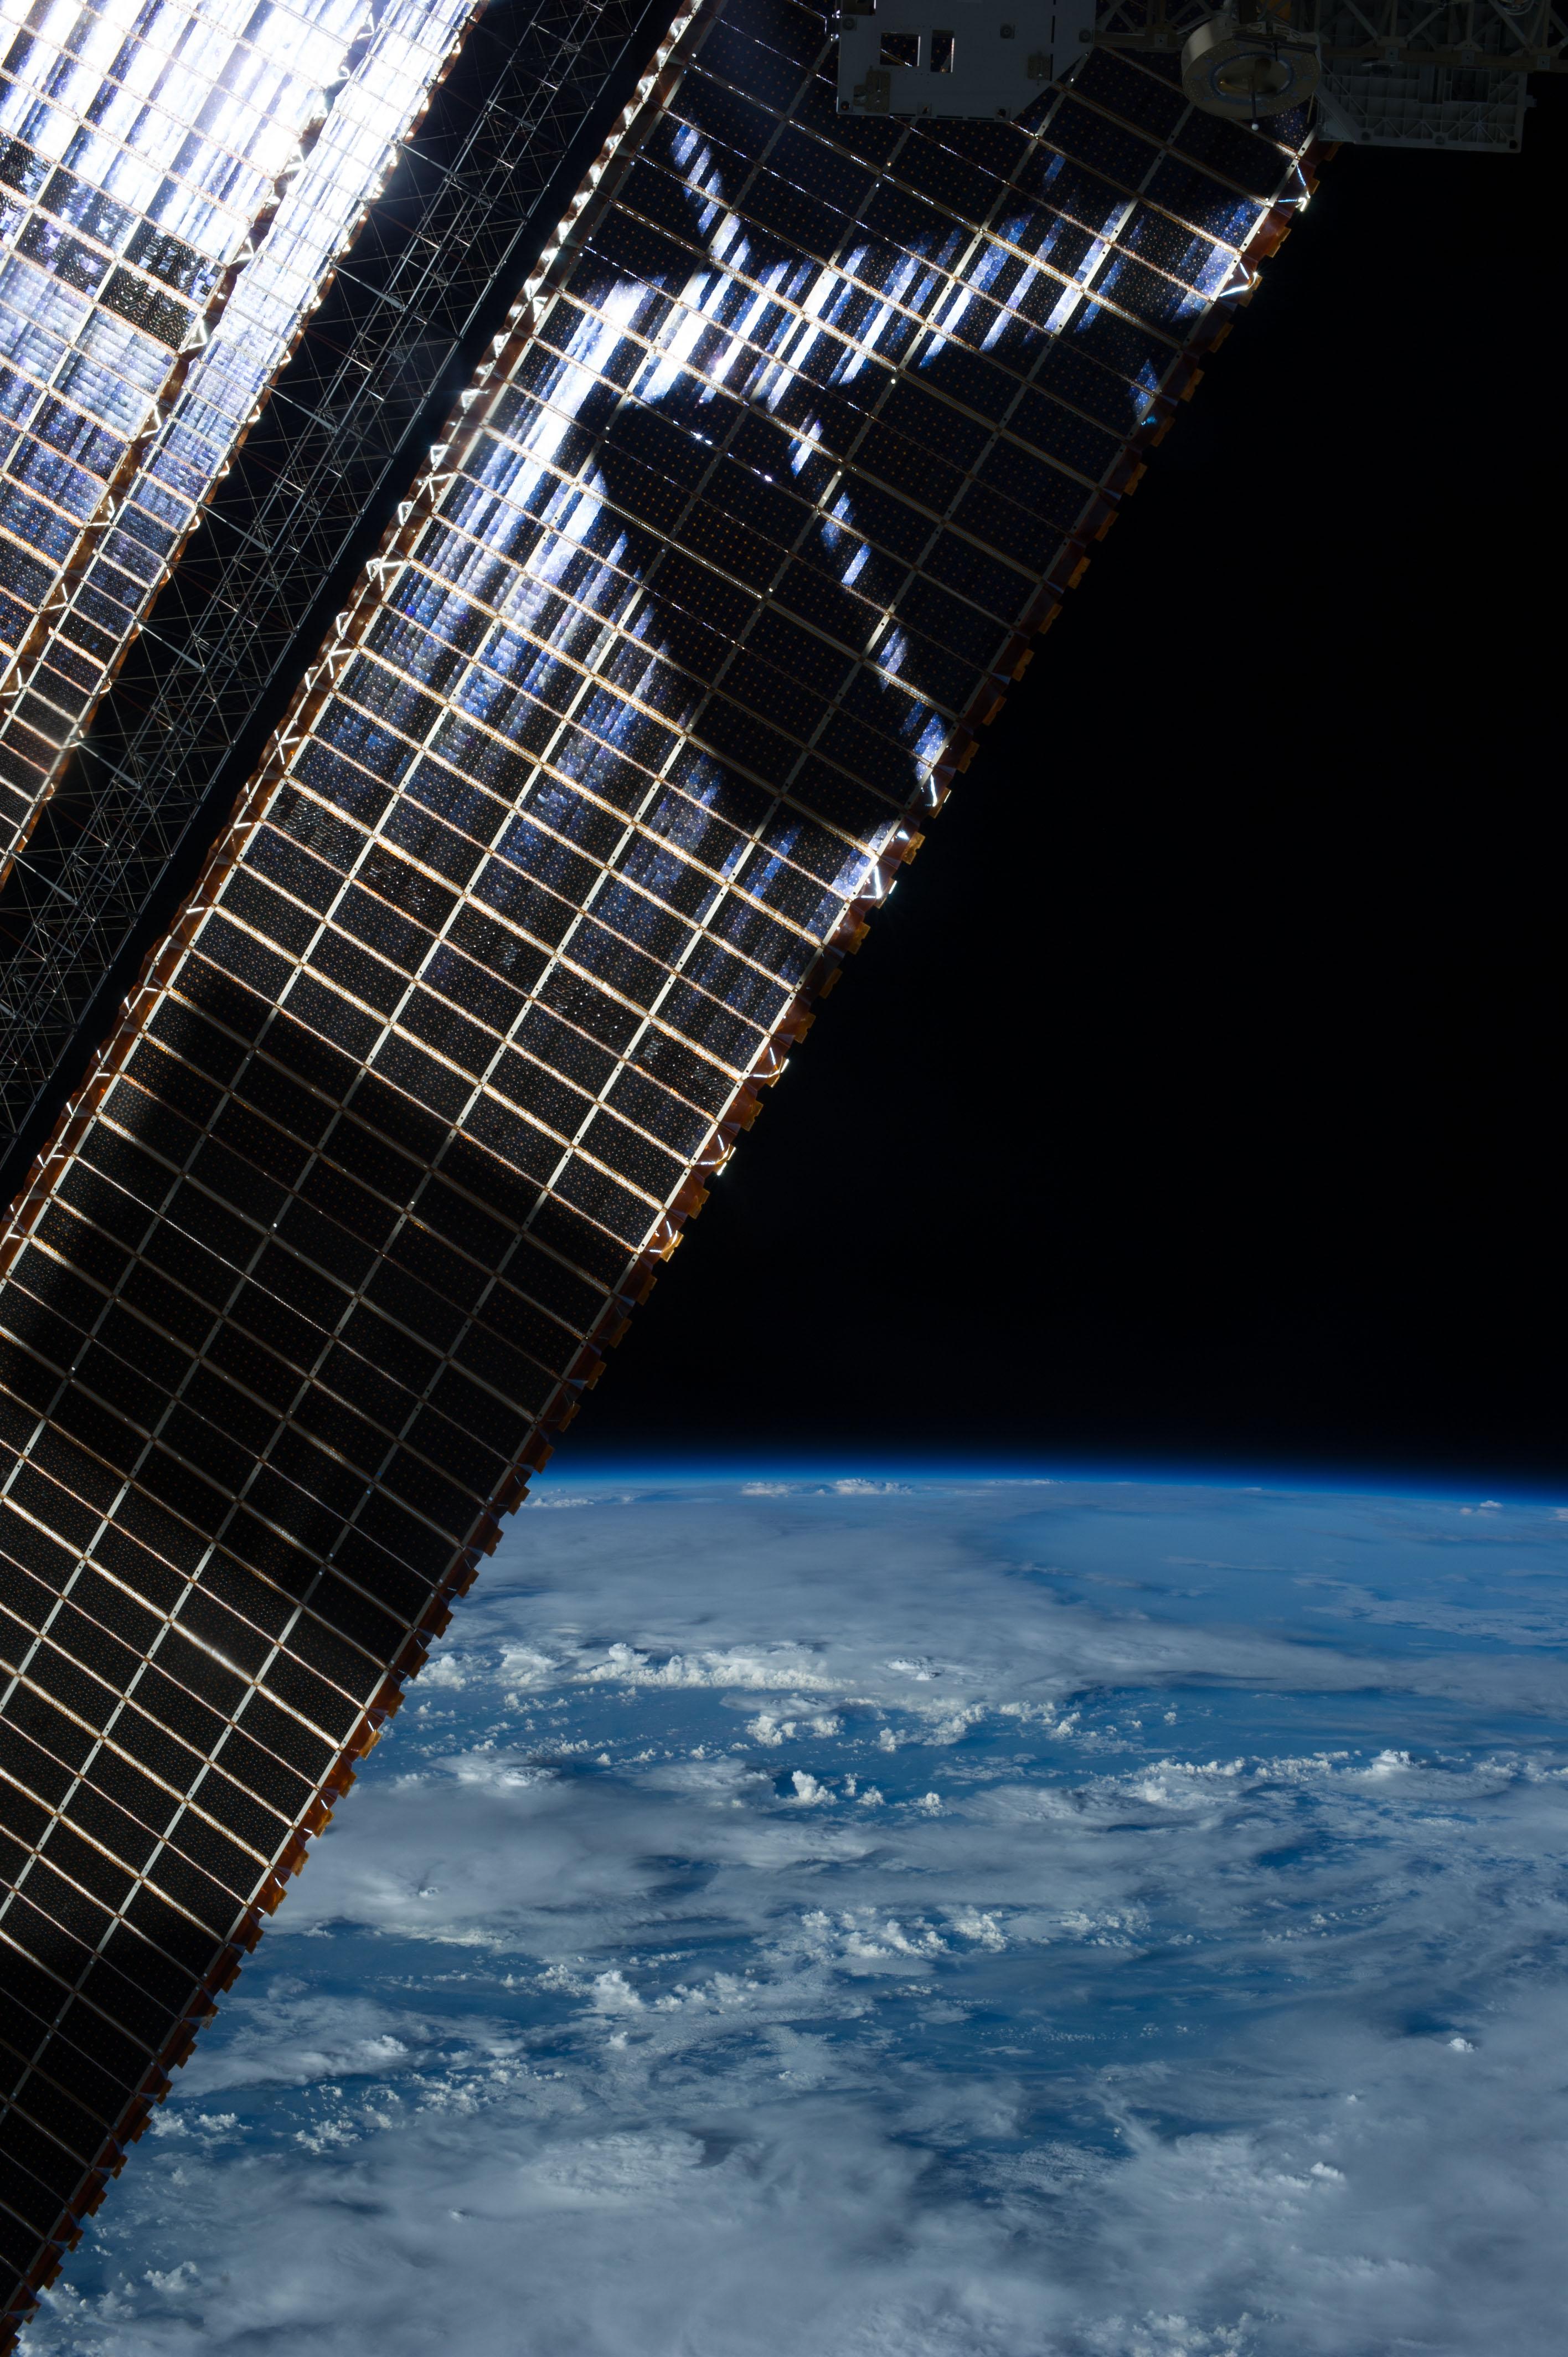 nasa ranger solar panels - photo #22